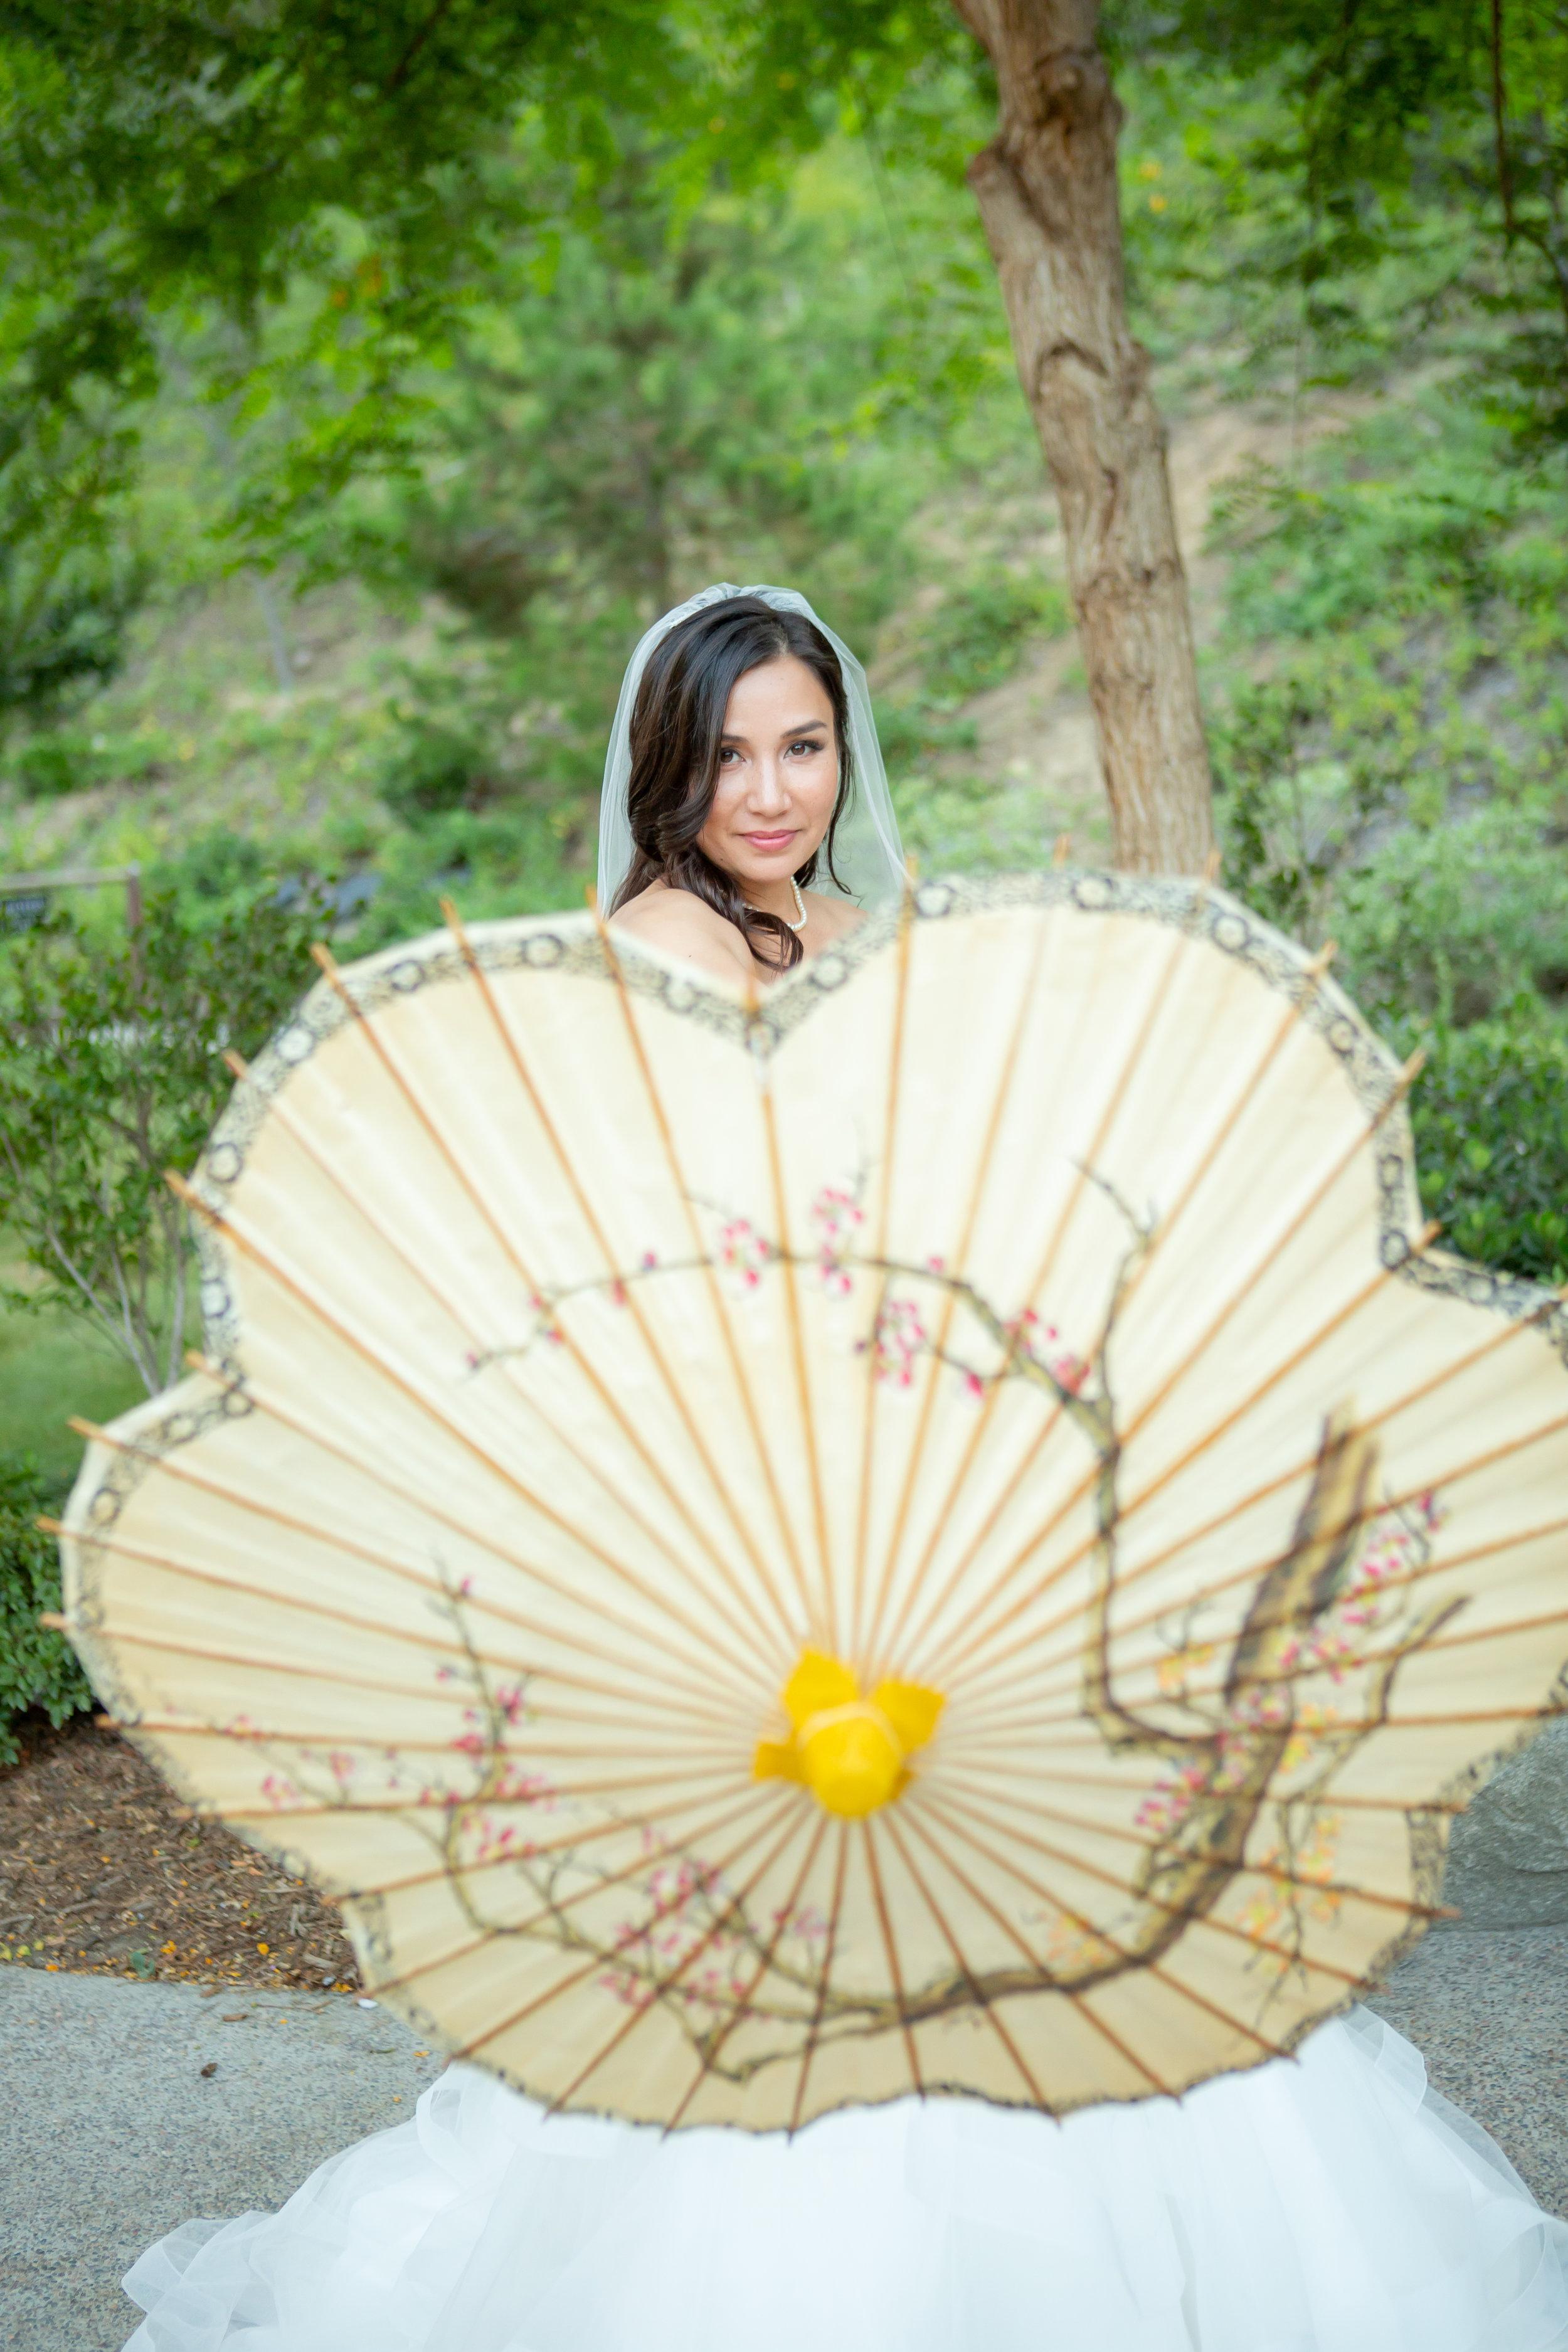 San-Diego-Wedding-Japenese-Friendship-Garden-Carla-David-2018-382.jpg